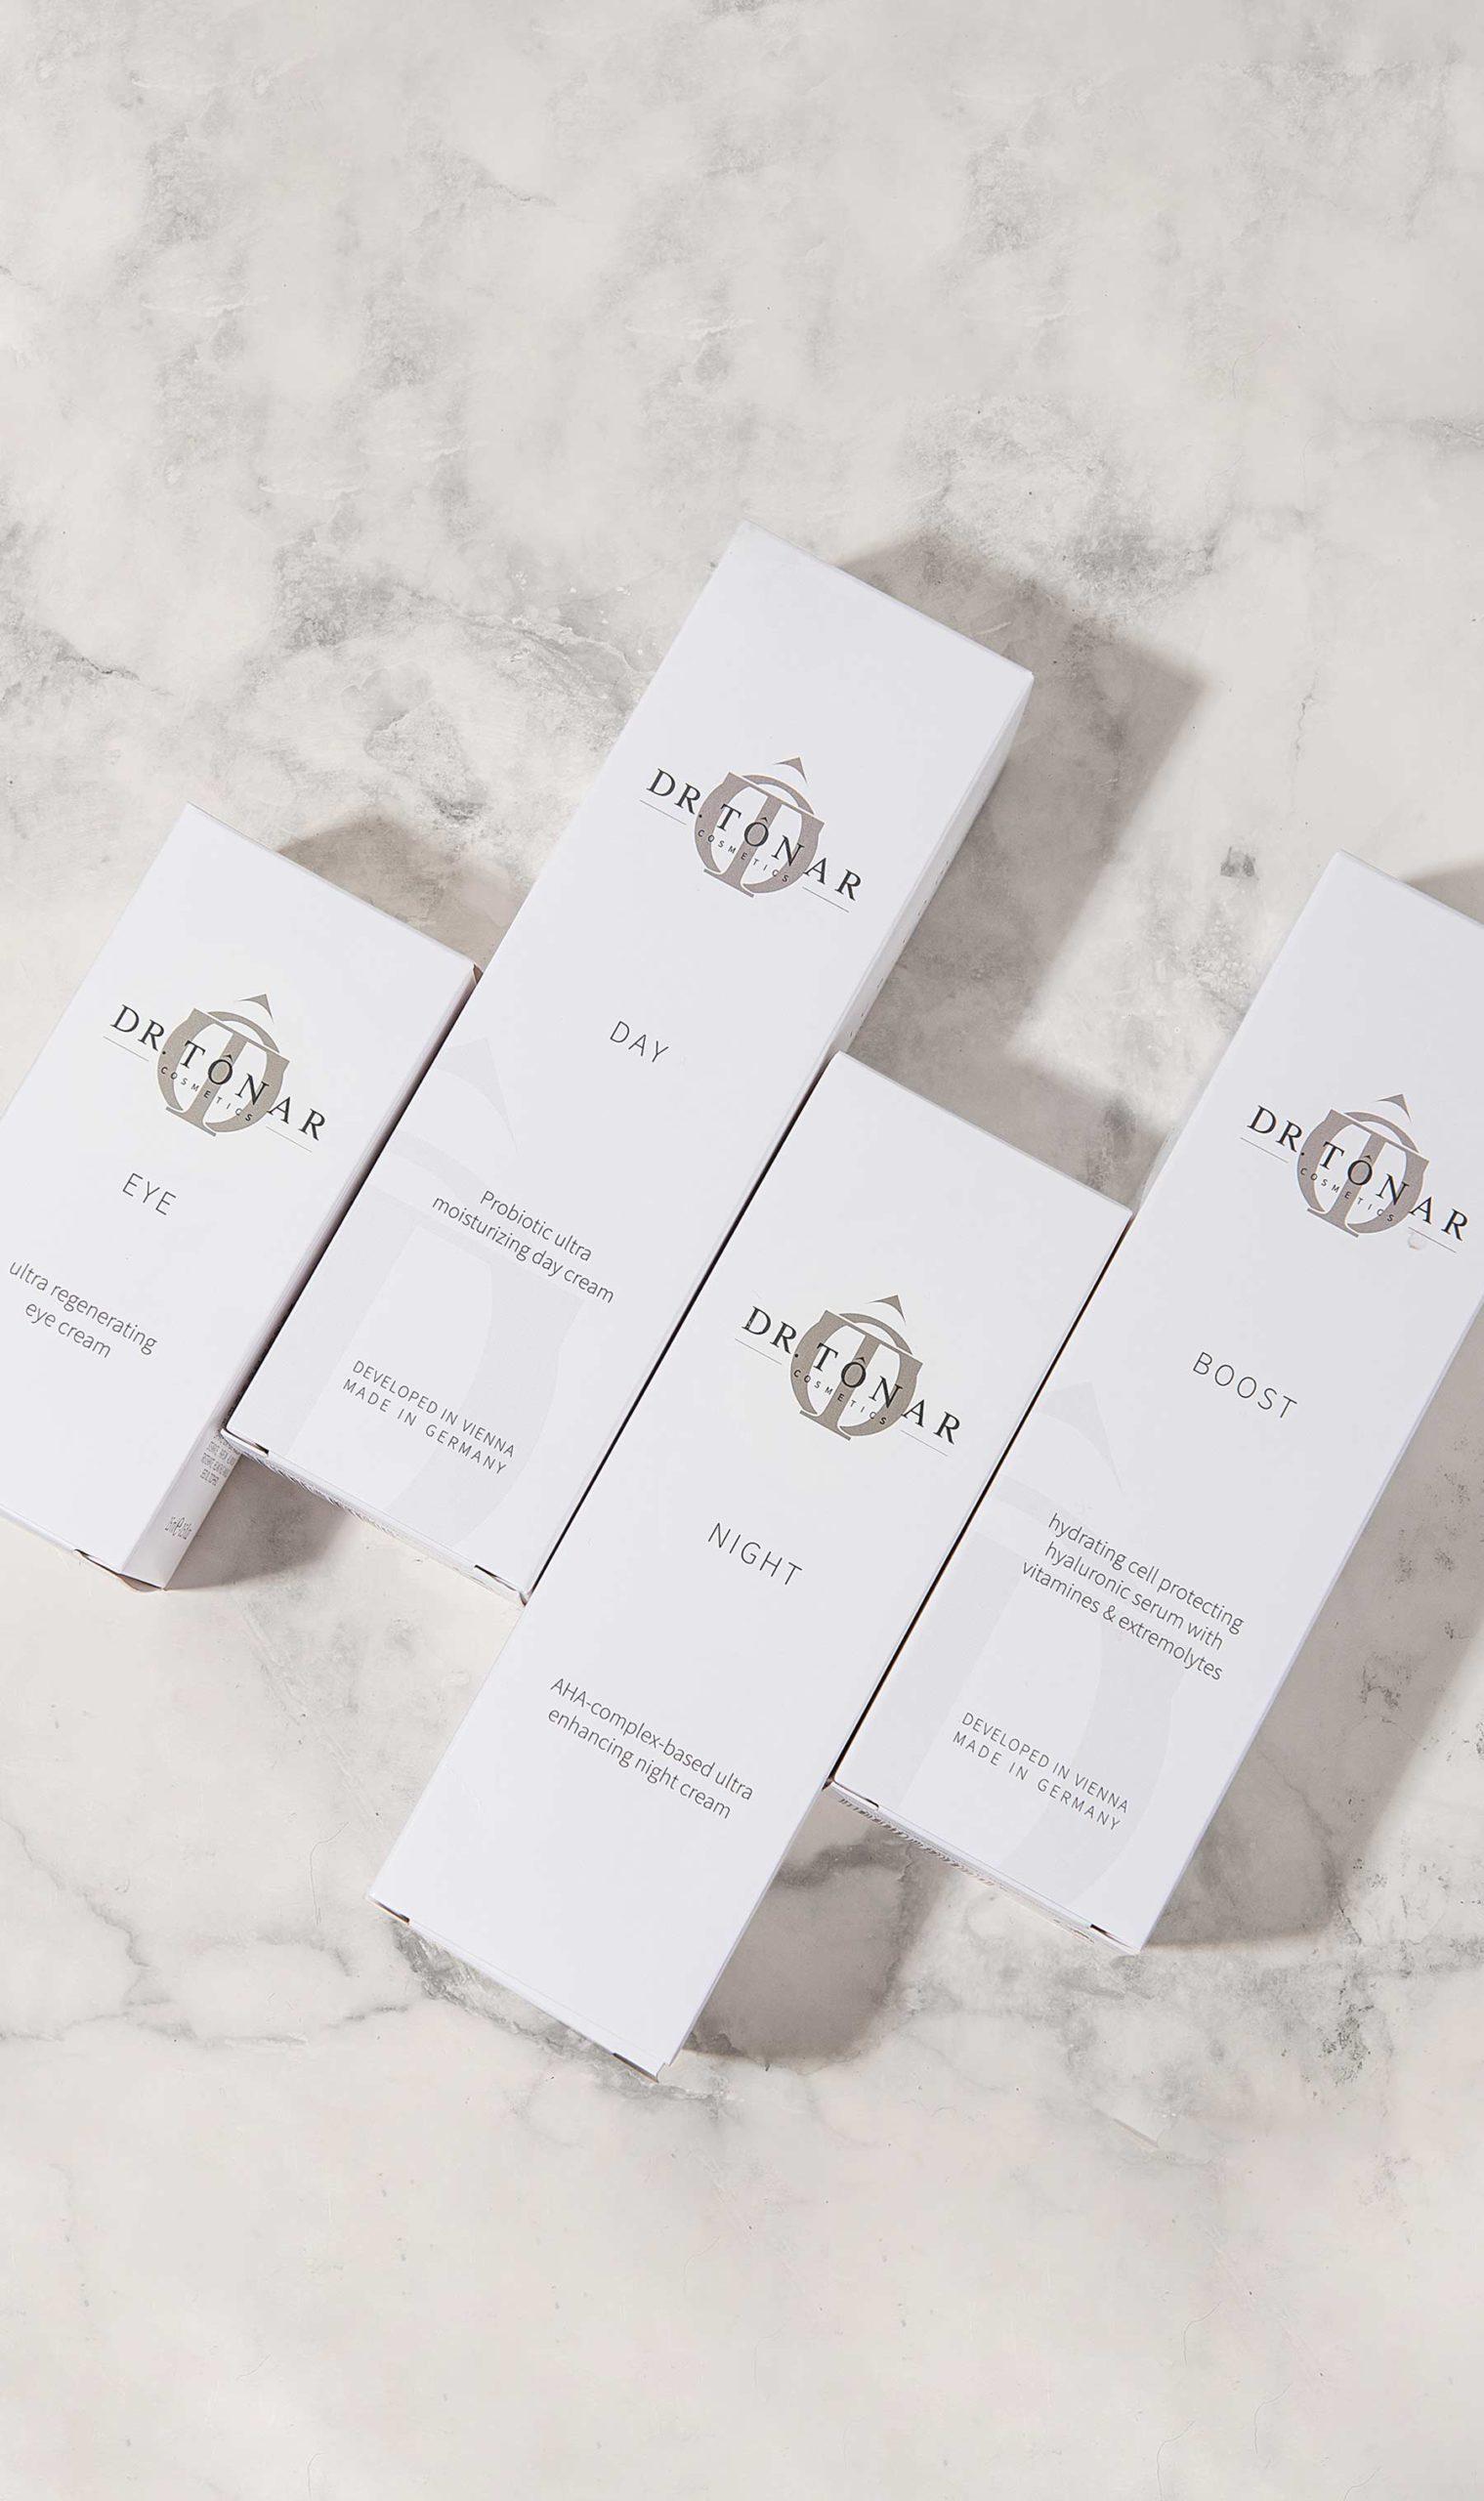 True-Creative-Agency-Business-Produktfotografie-2